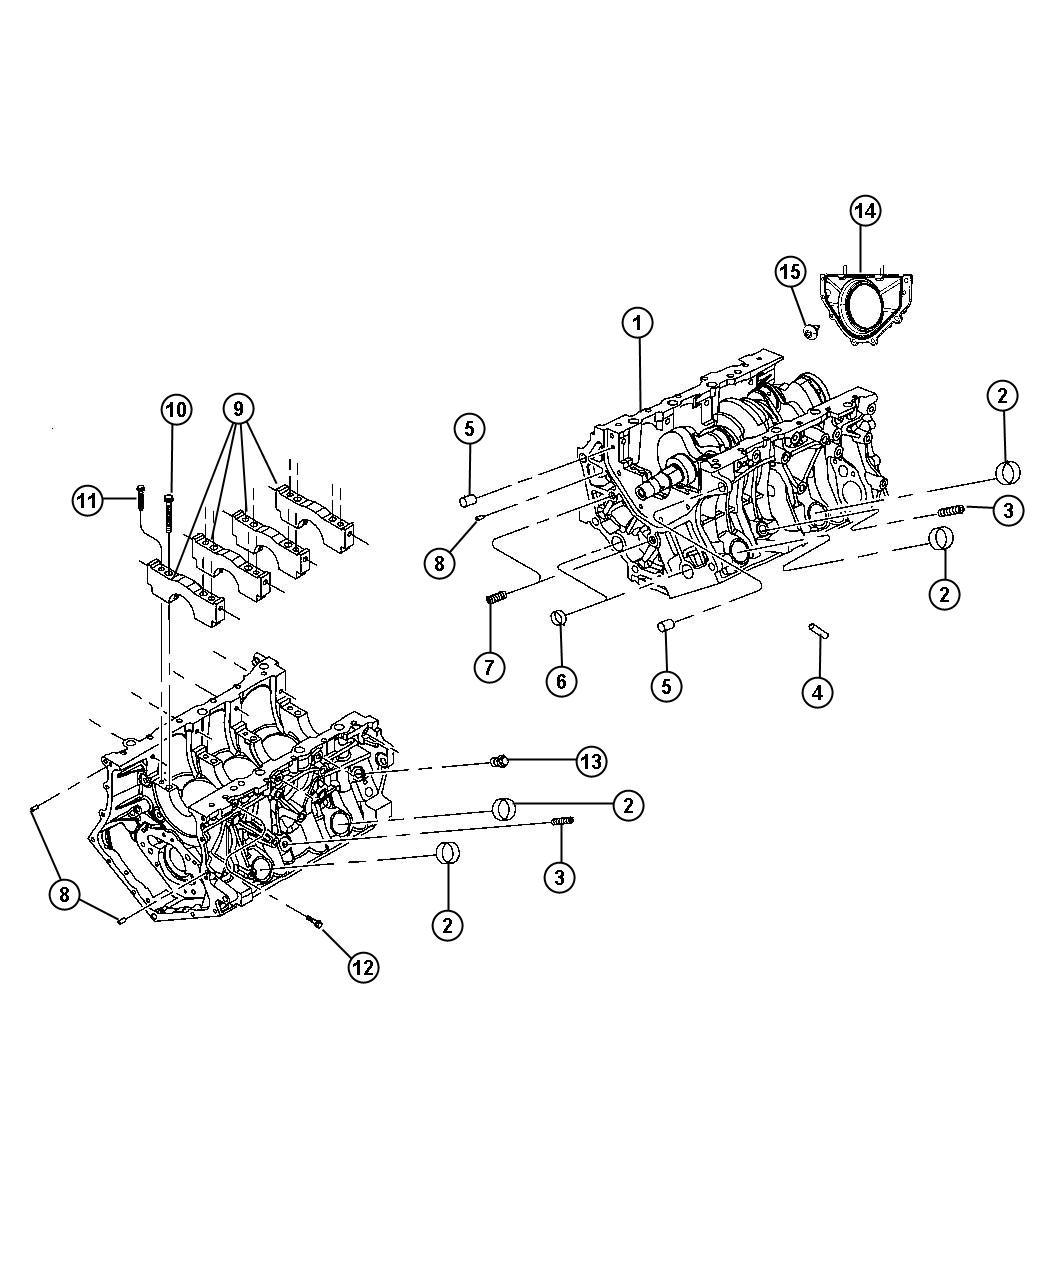 2001 Dodge Stratus Engine. Long block. Return, new, core